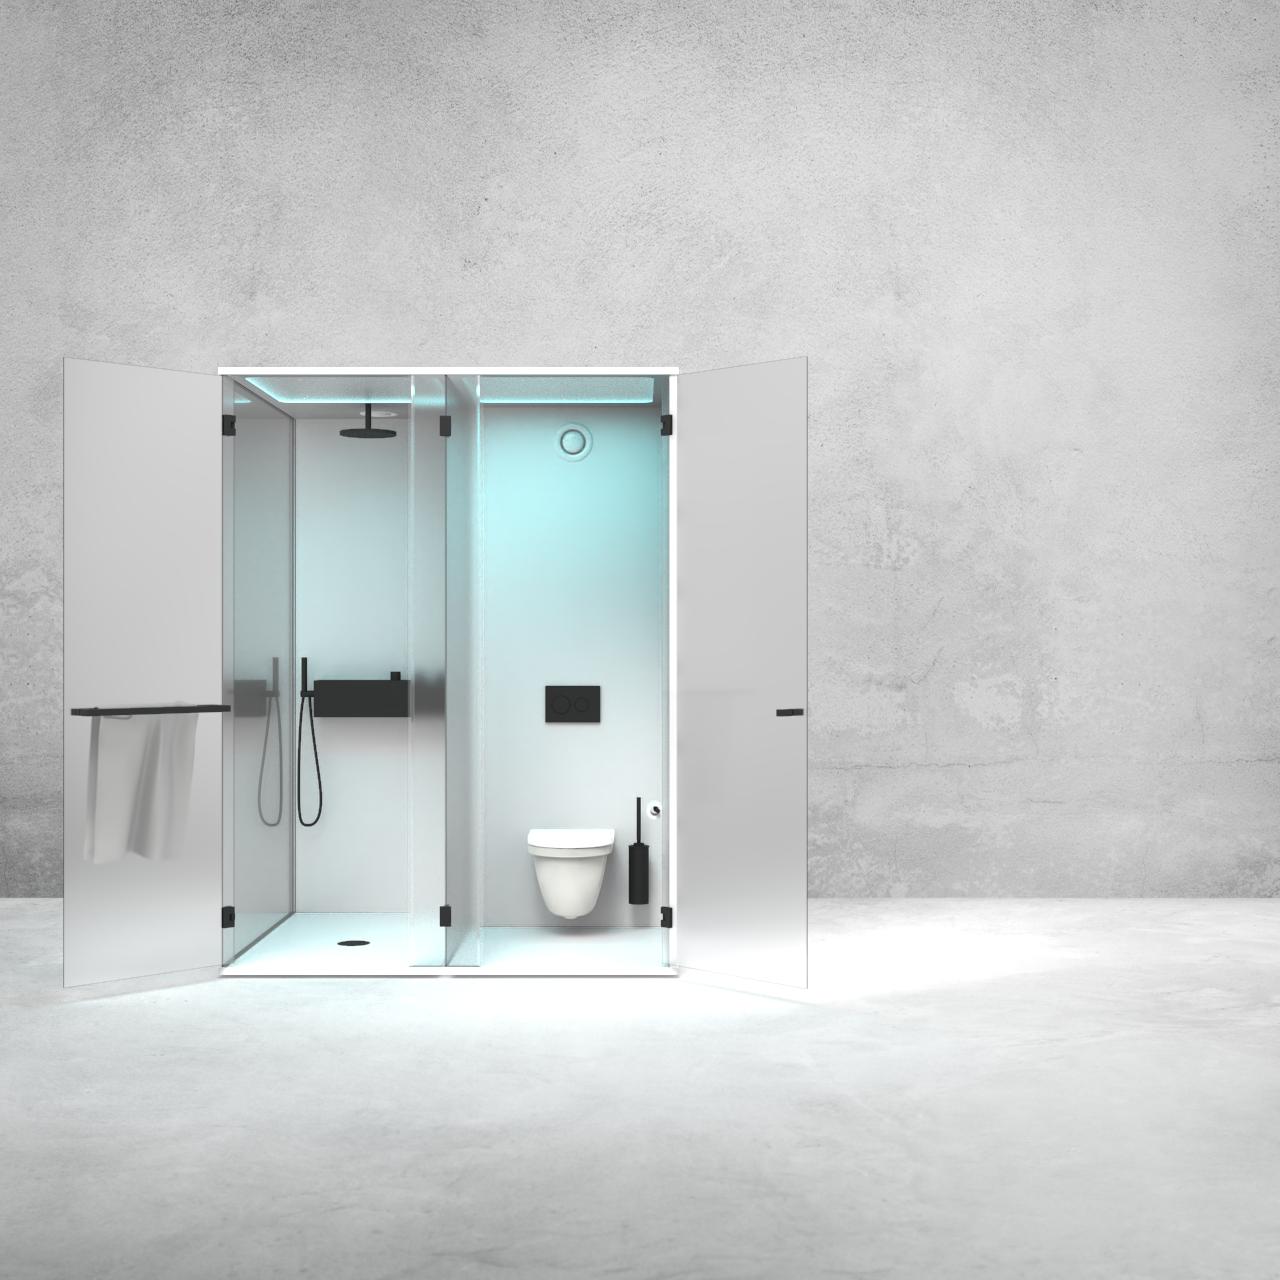 Prefab modulaire badkamer, Saniskill